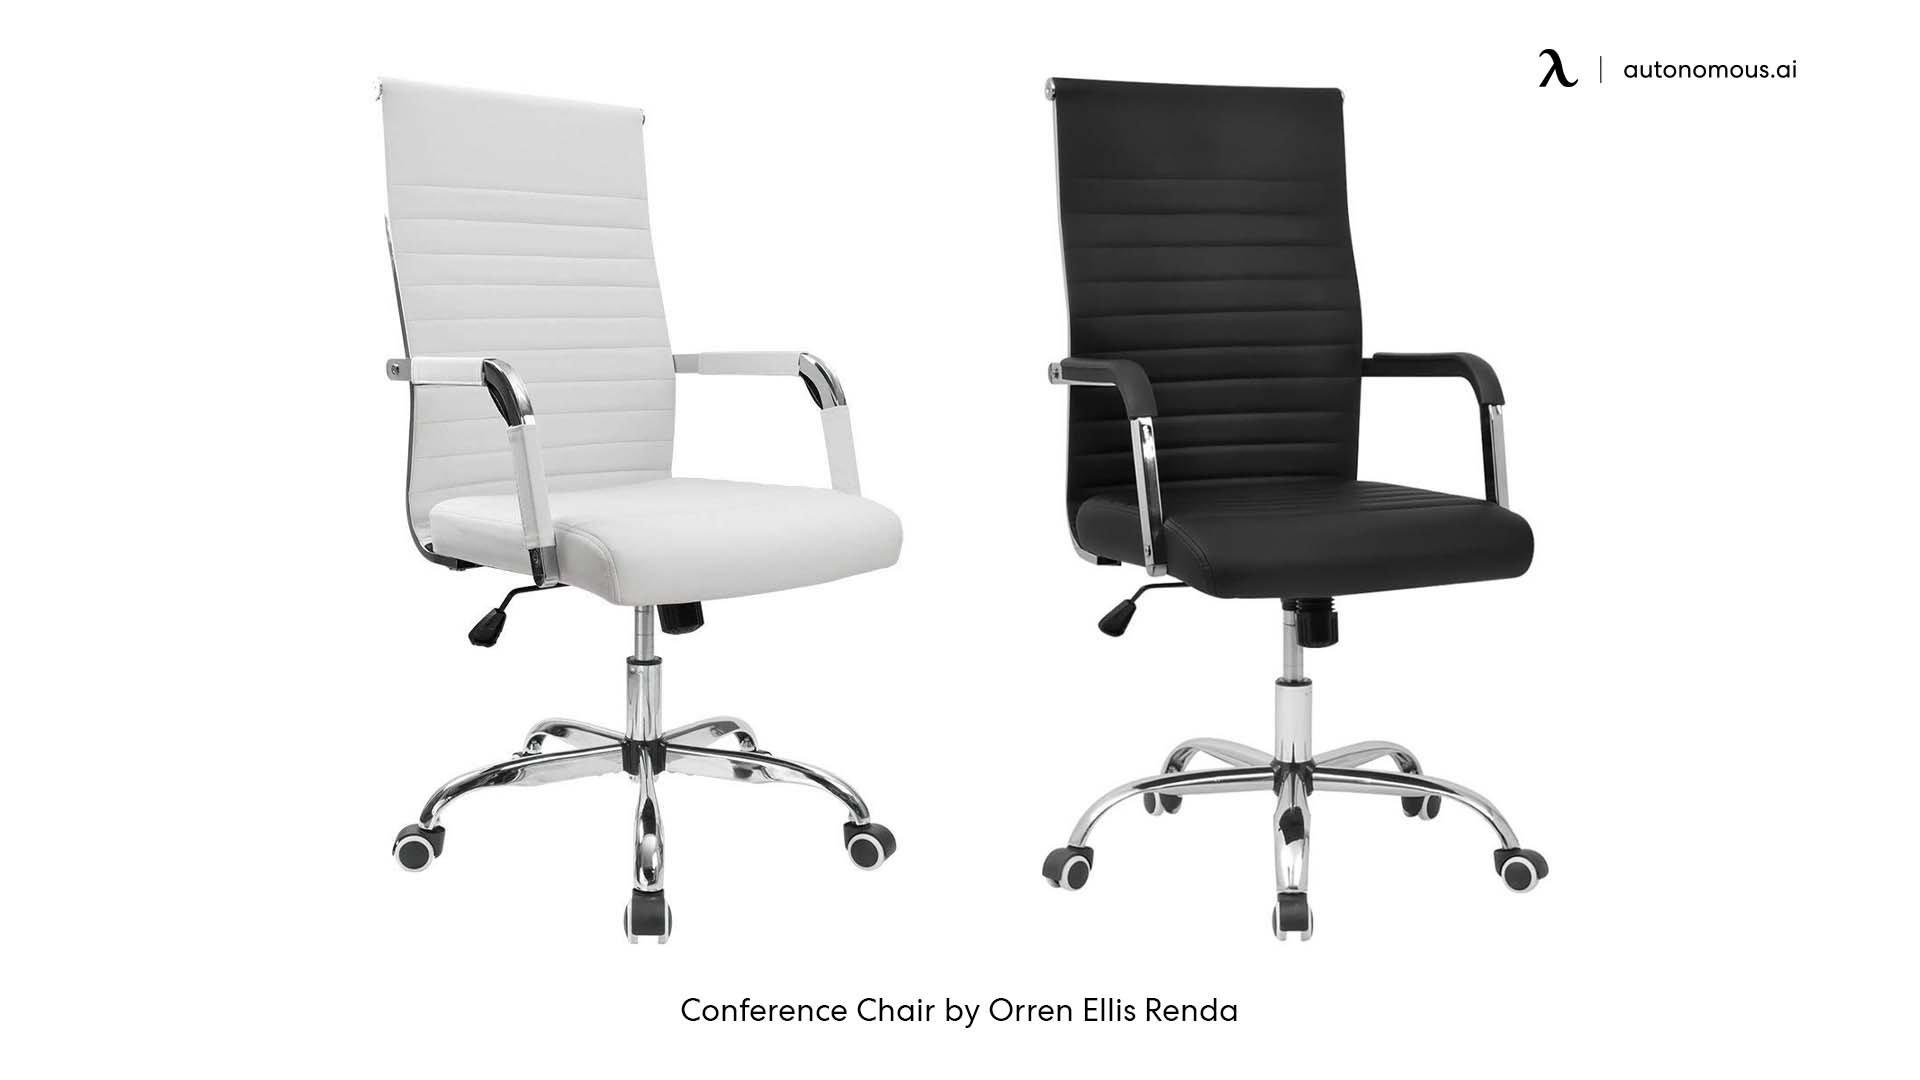 Conference Chair by Orren Ellis Renda